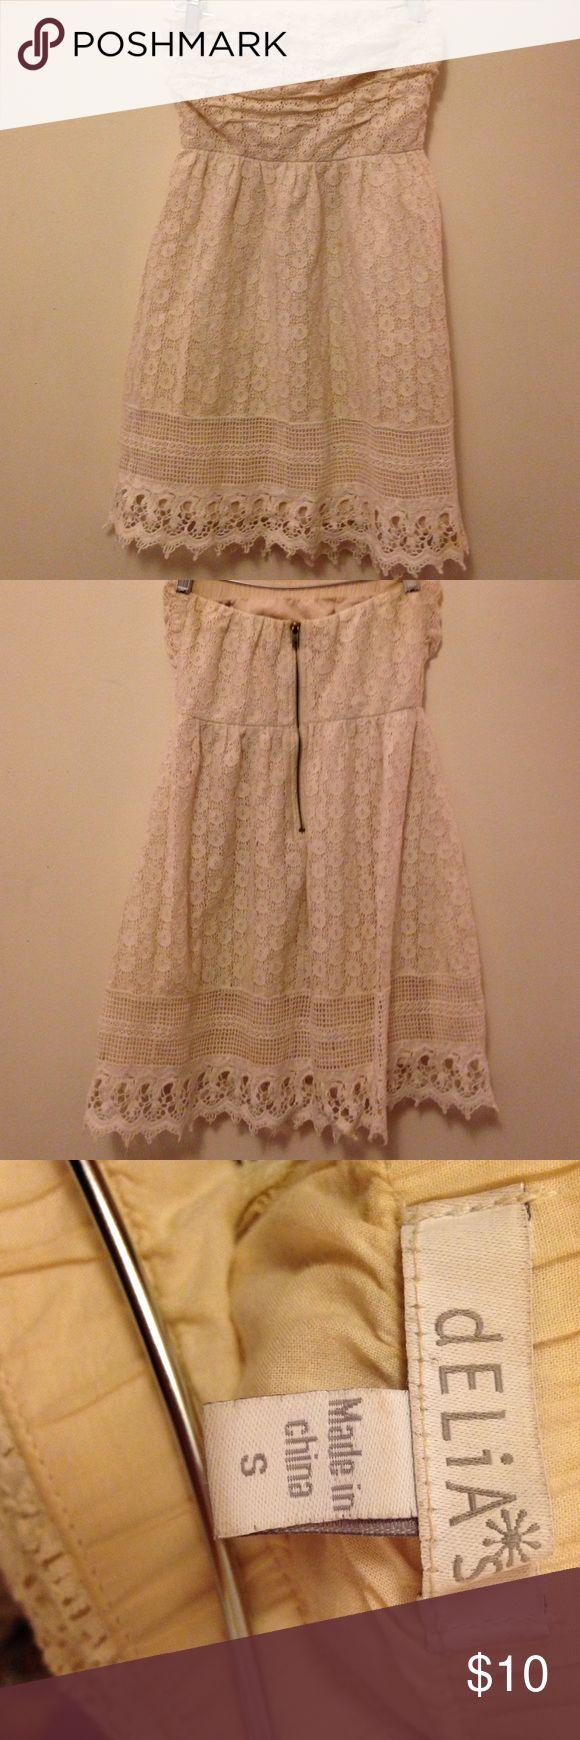 White Strapless Summer Dress Delia's white summer strapless dress. Size S. Barely worn, no damages! Delia's Dresses Strapless